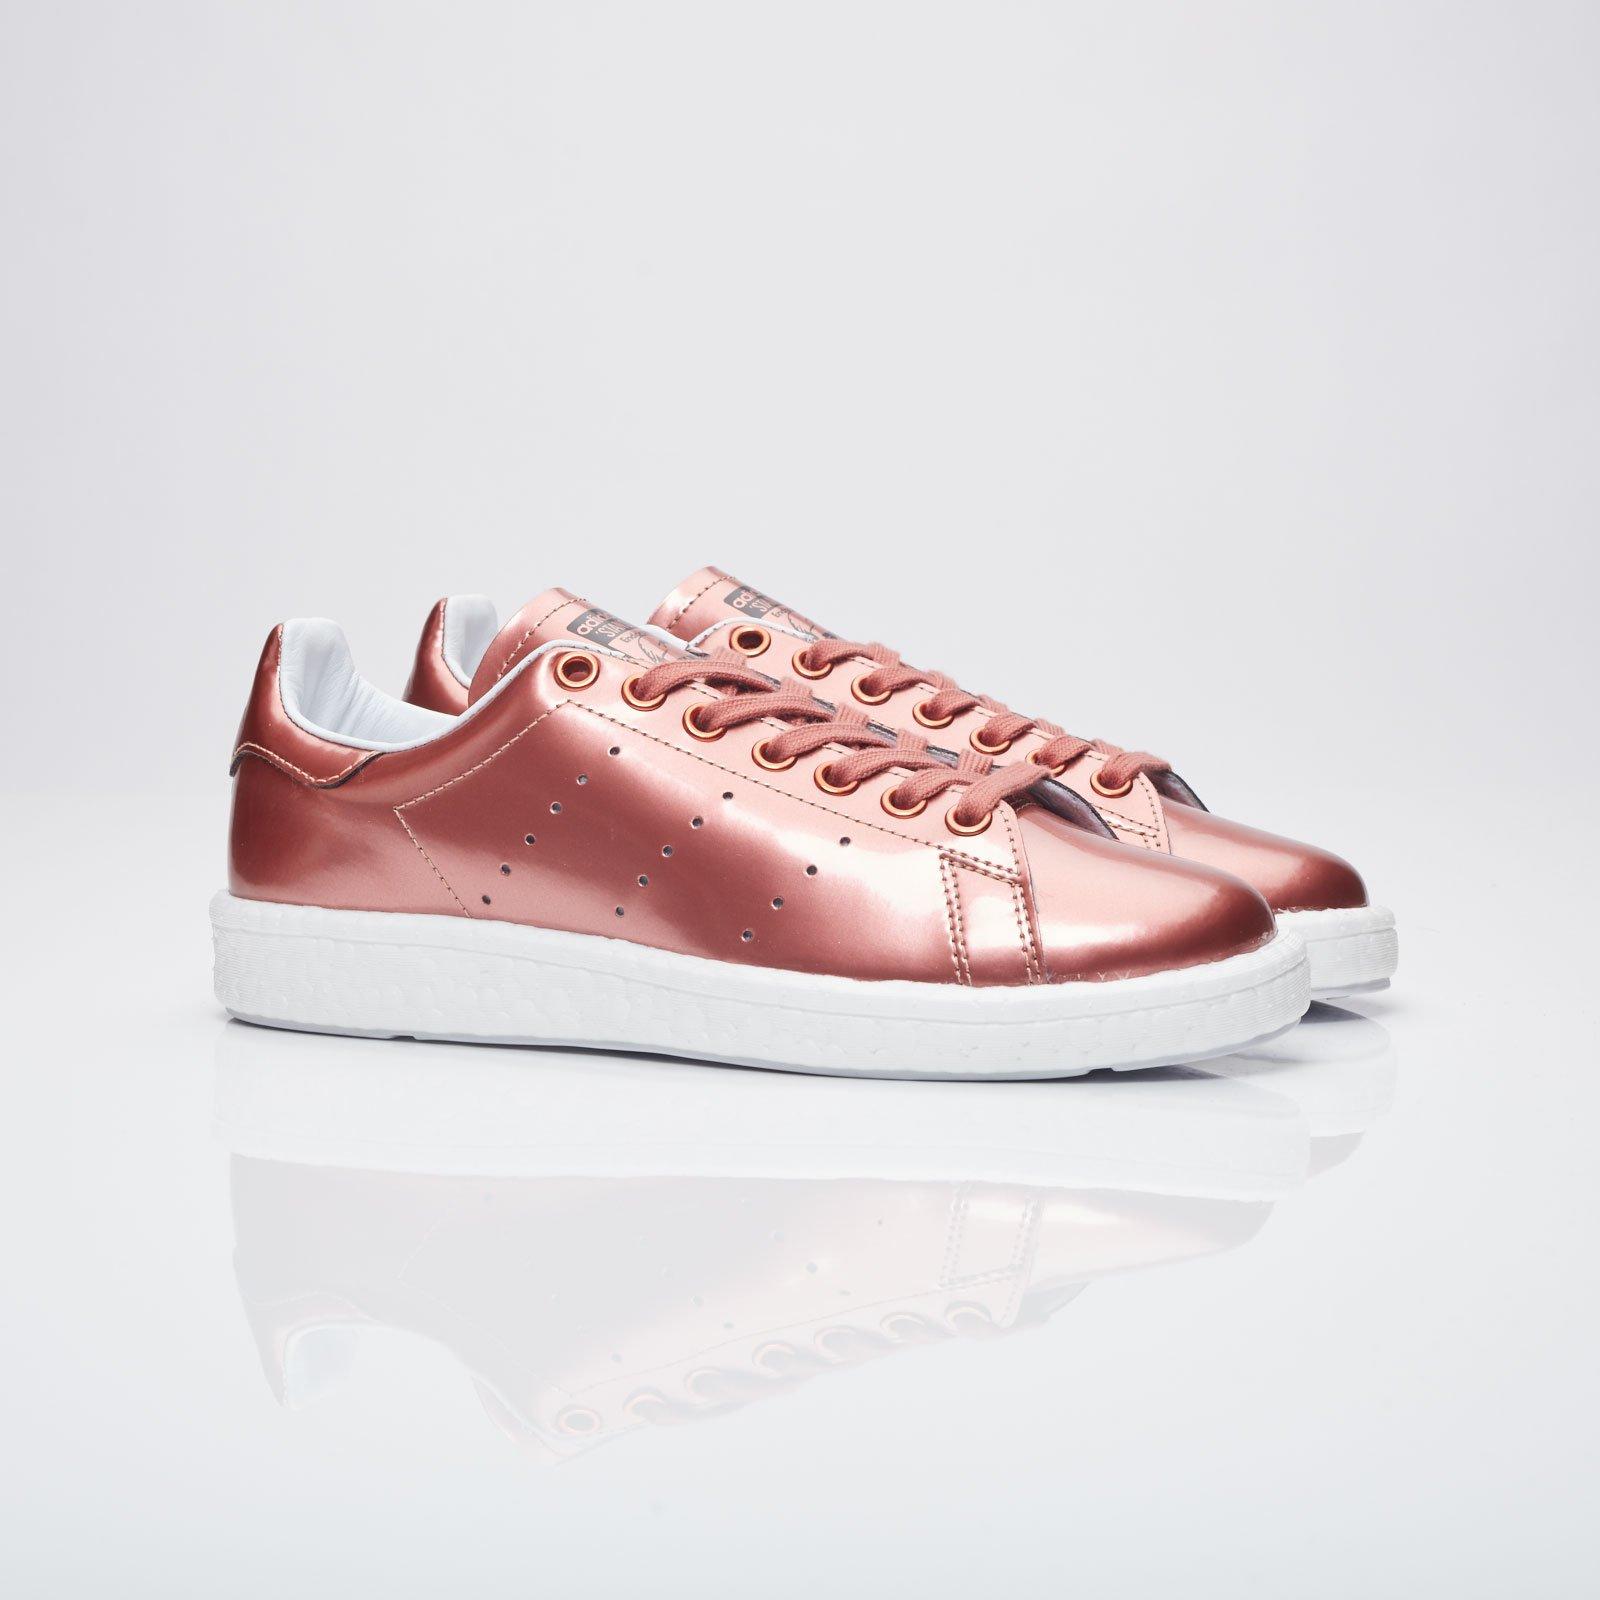 7f70c9c5da2b adidas W Stan Smith Boost - Bb0107 - Sneakersnstuff